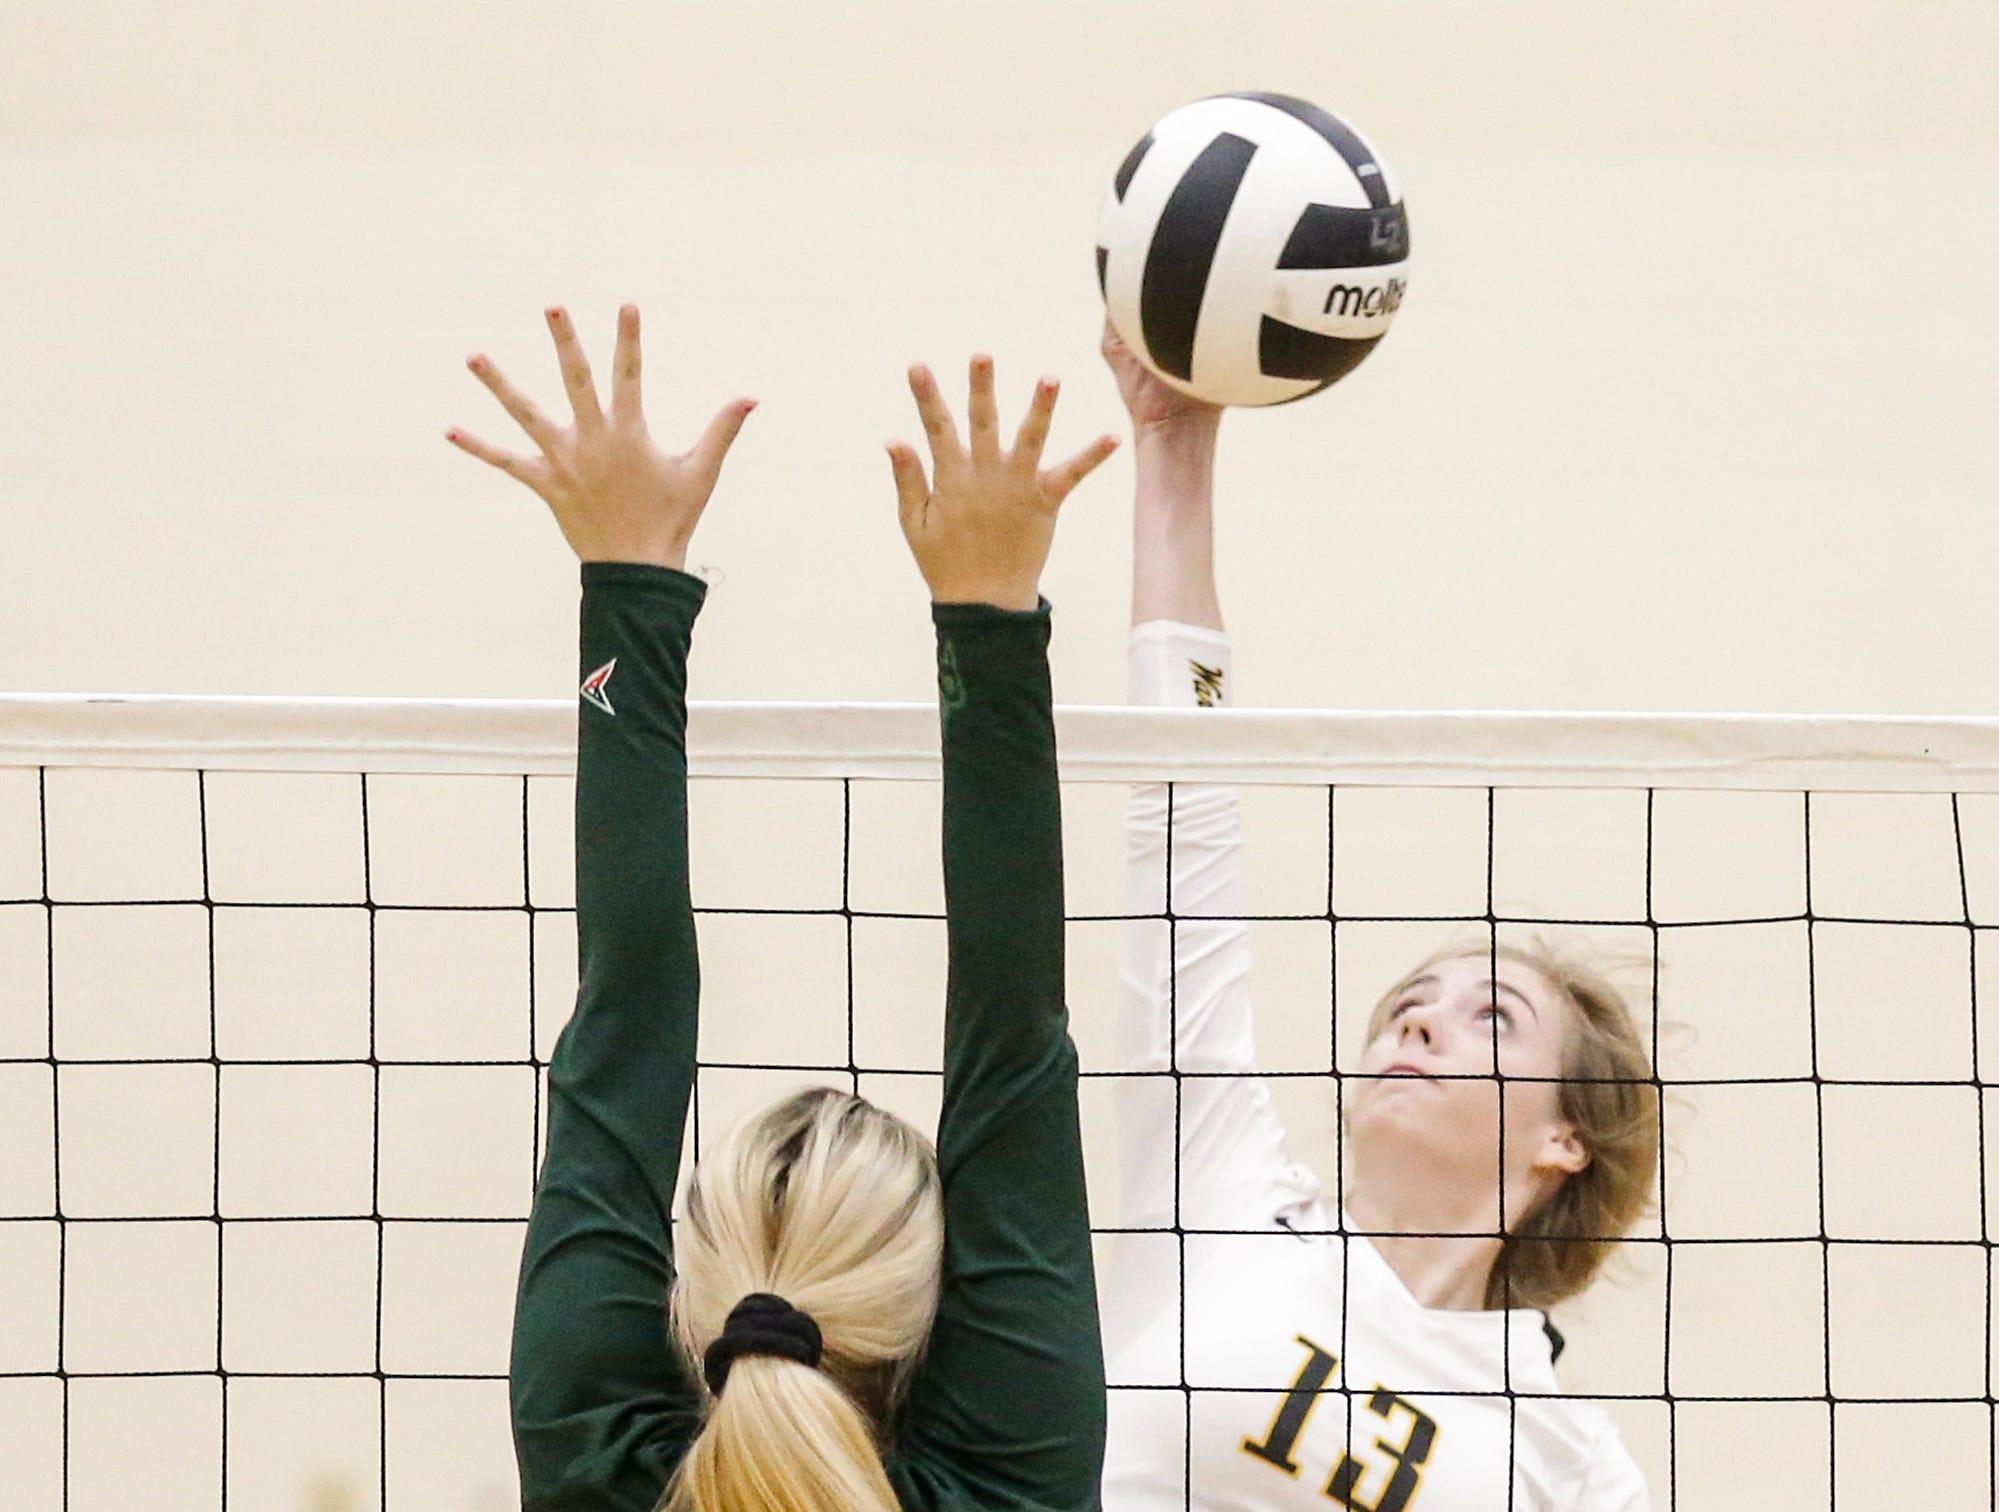 Waupun High School volleyball's McKenna Cunningham hits the ball against Berlin High School during their WIAA regional quarter-final playoff game Tuesday, Oct. 16, 2018, in Waupun.